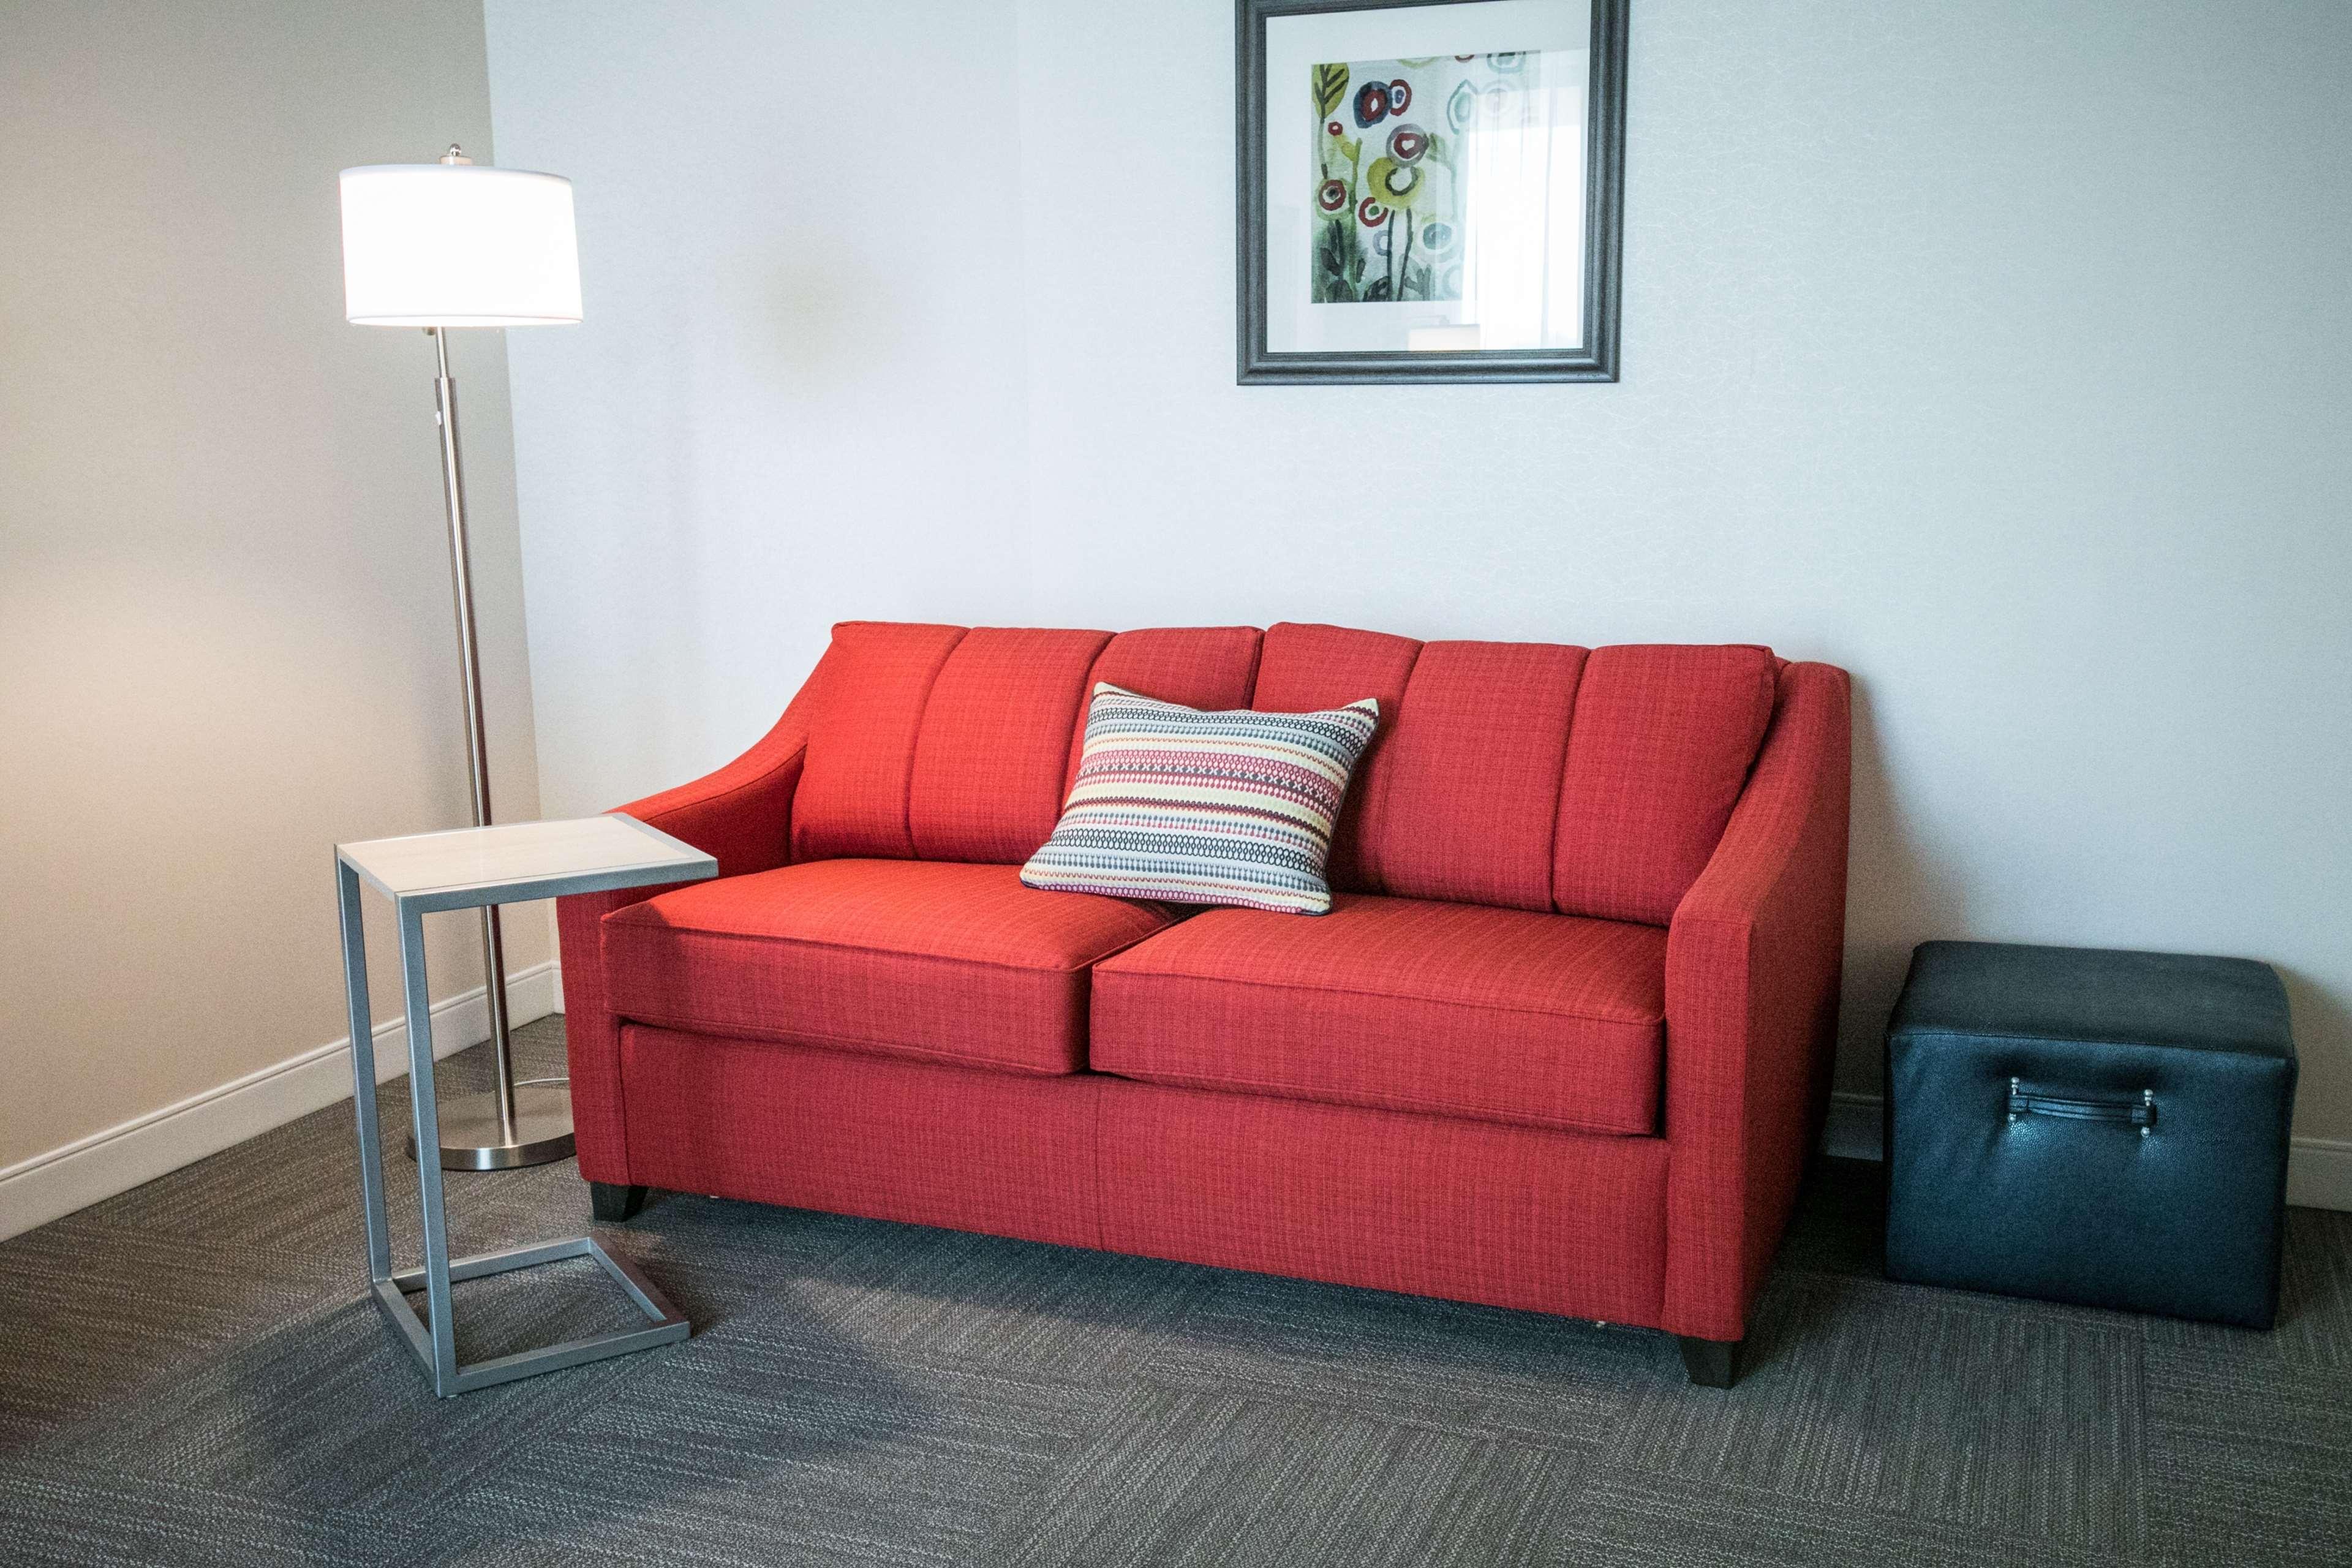 Hampton Inn & Suites Tempe - Phoenix Airport image 37